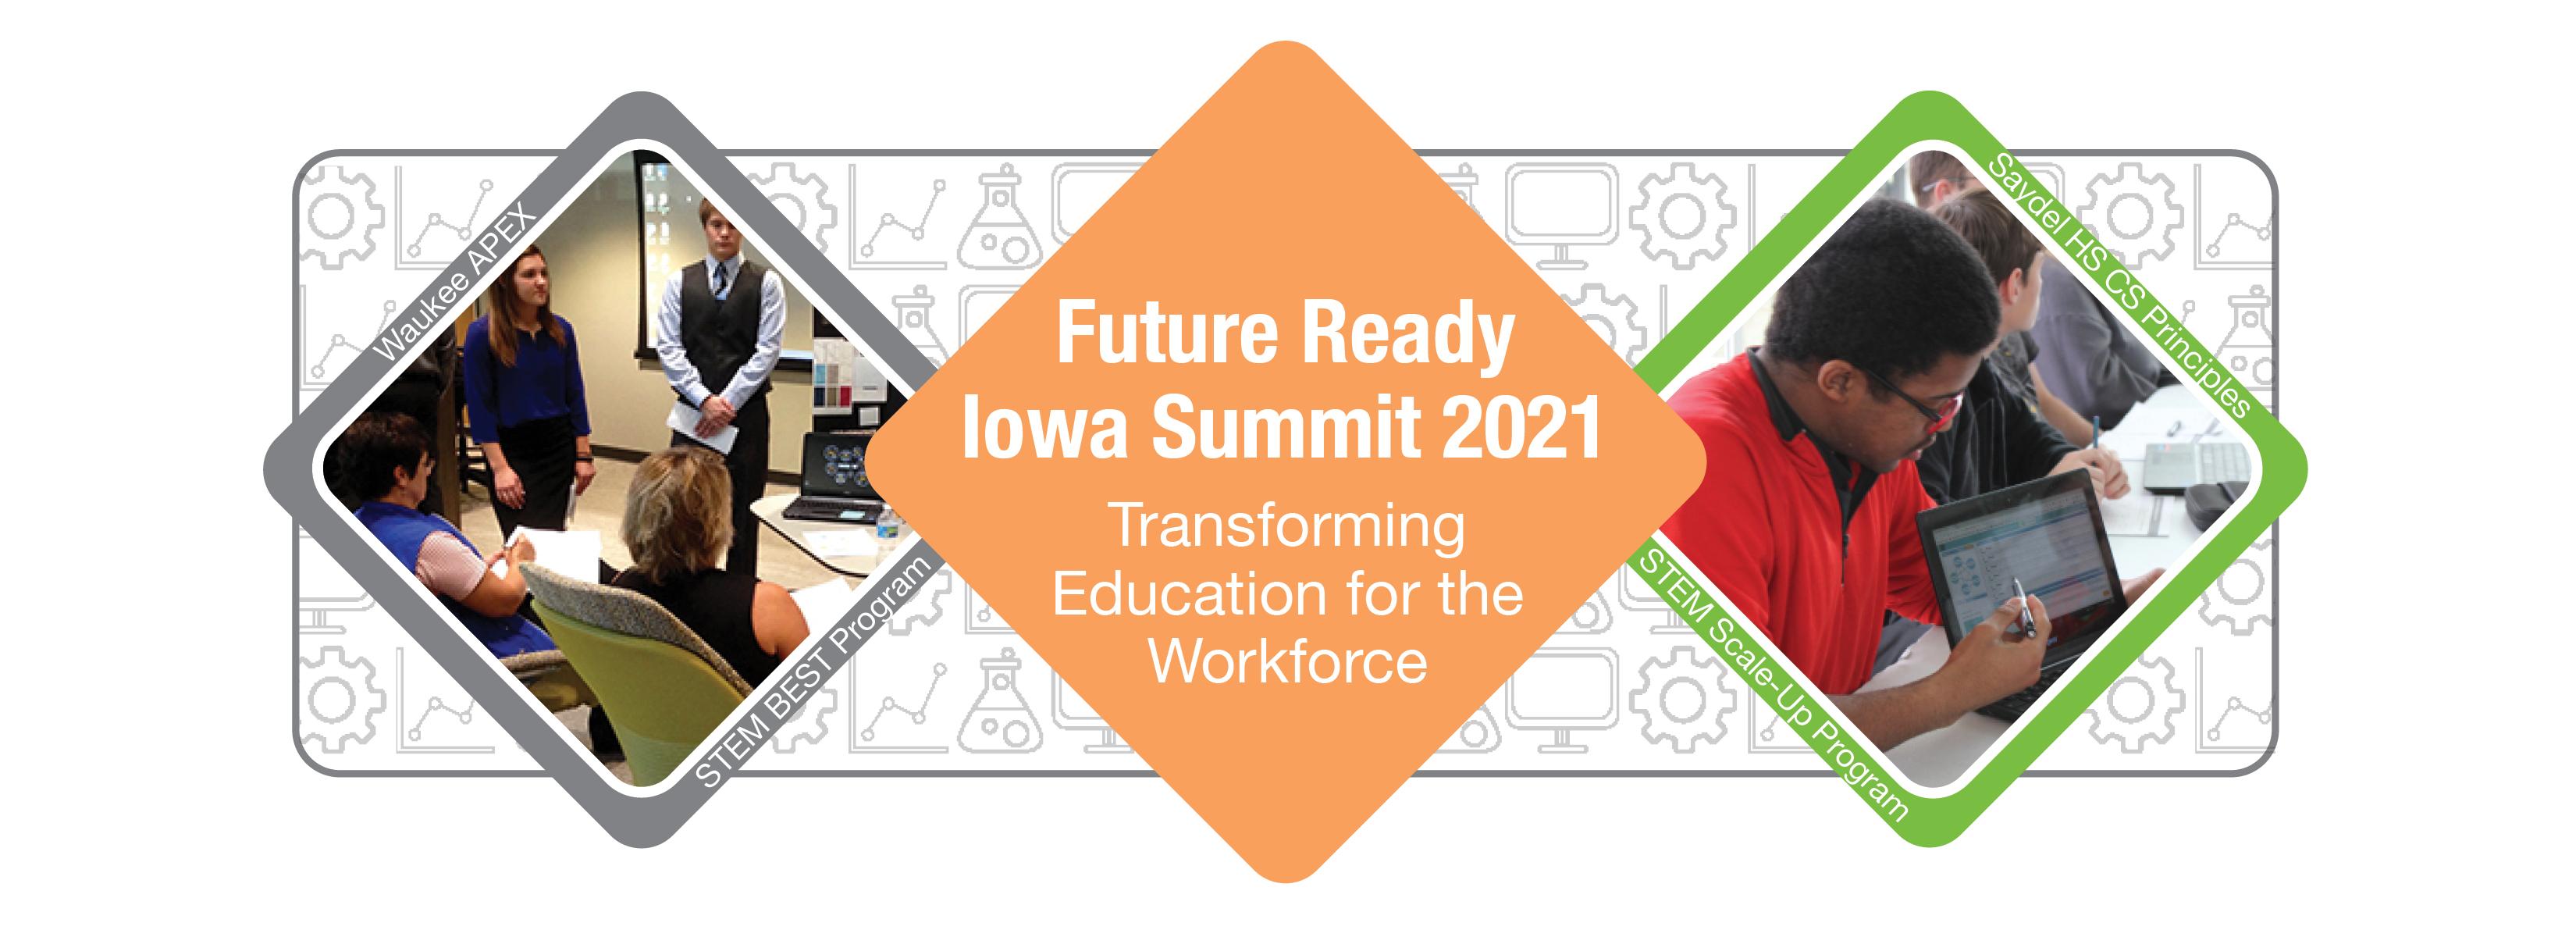 Future Ready Iowa Summit